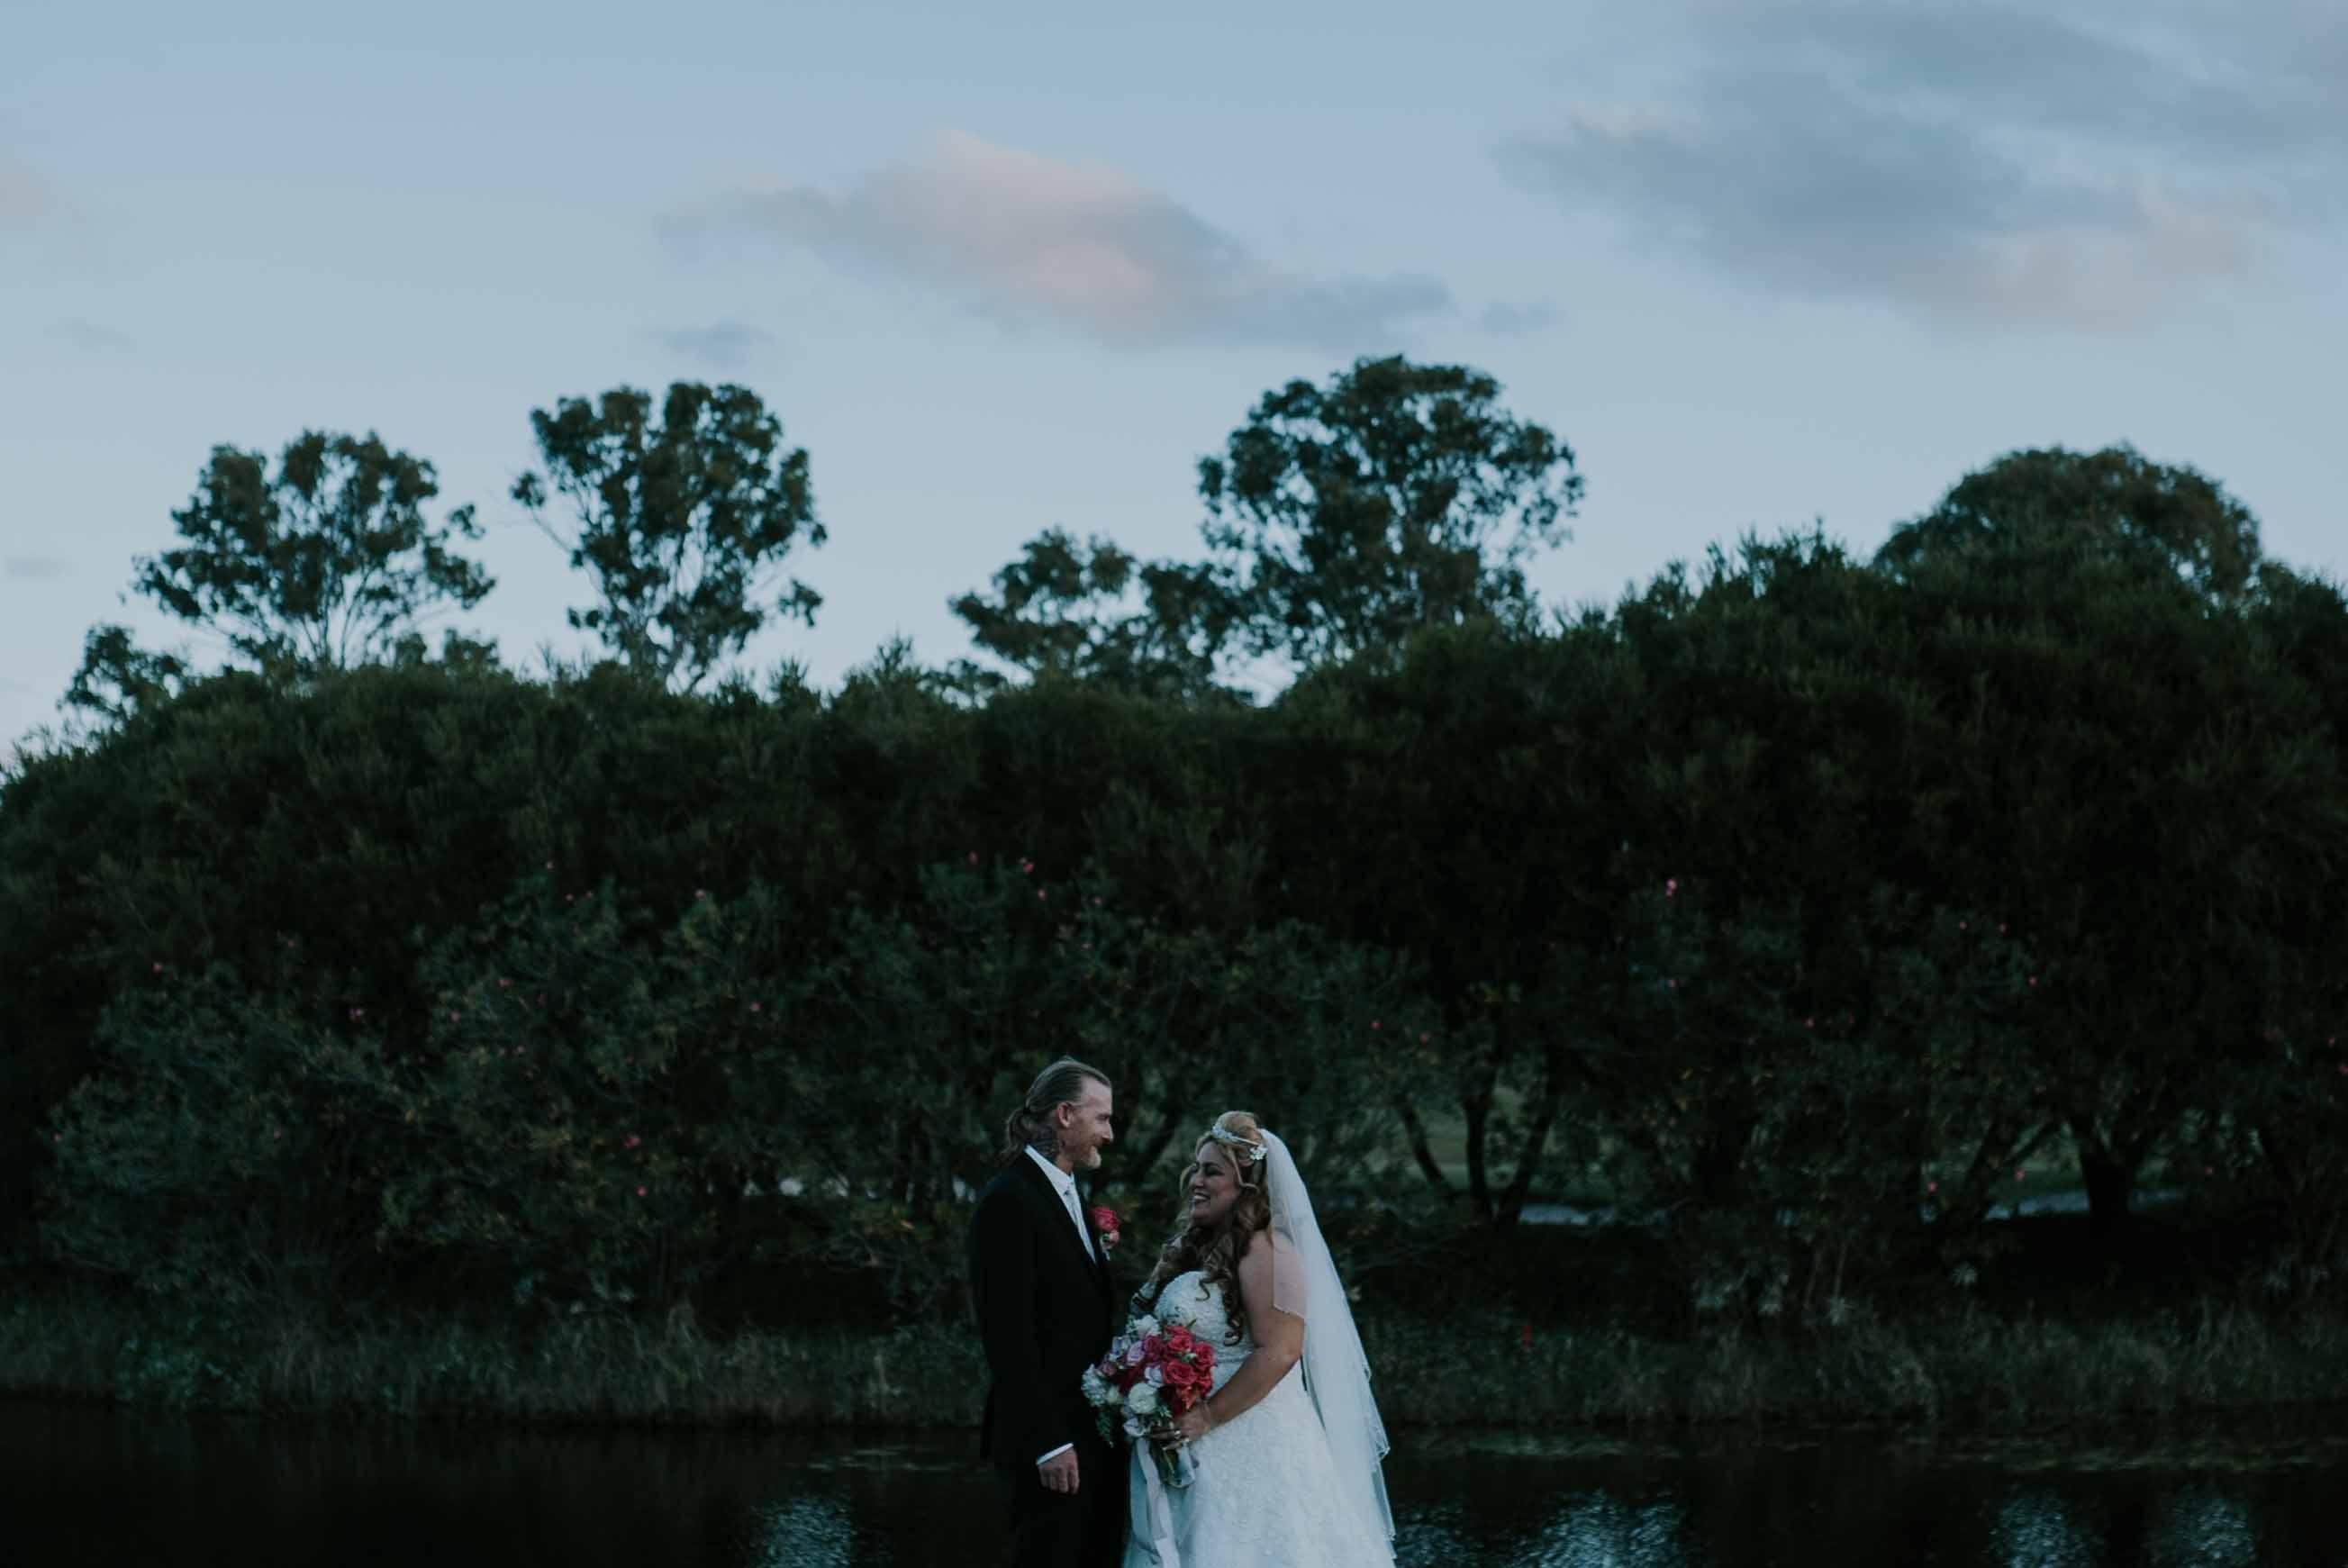 Steve + Joanne   15/04/2017   Gold Coast Wedding Video   Parkwood International Golf Course, Parkwood, QLD